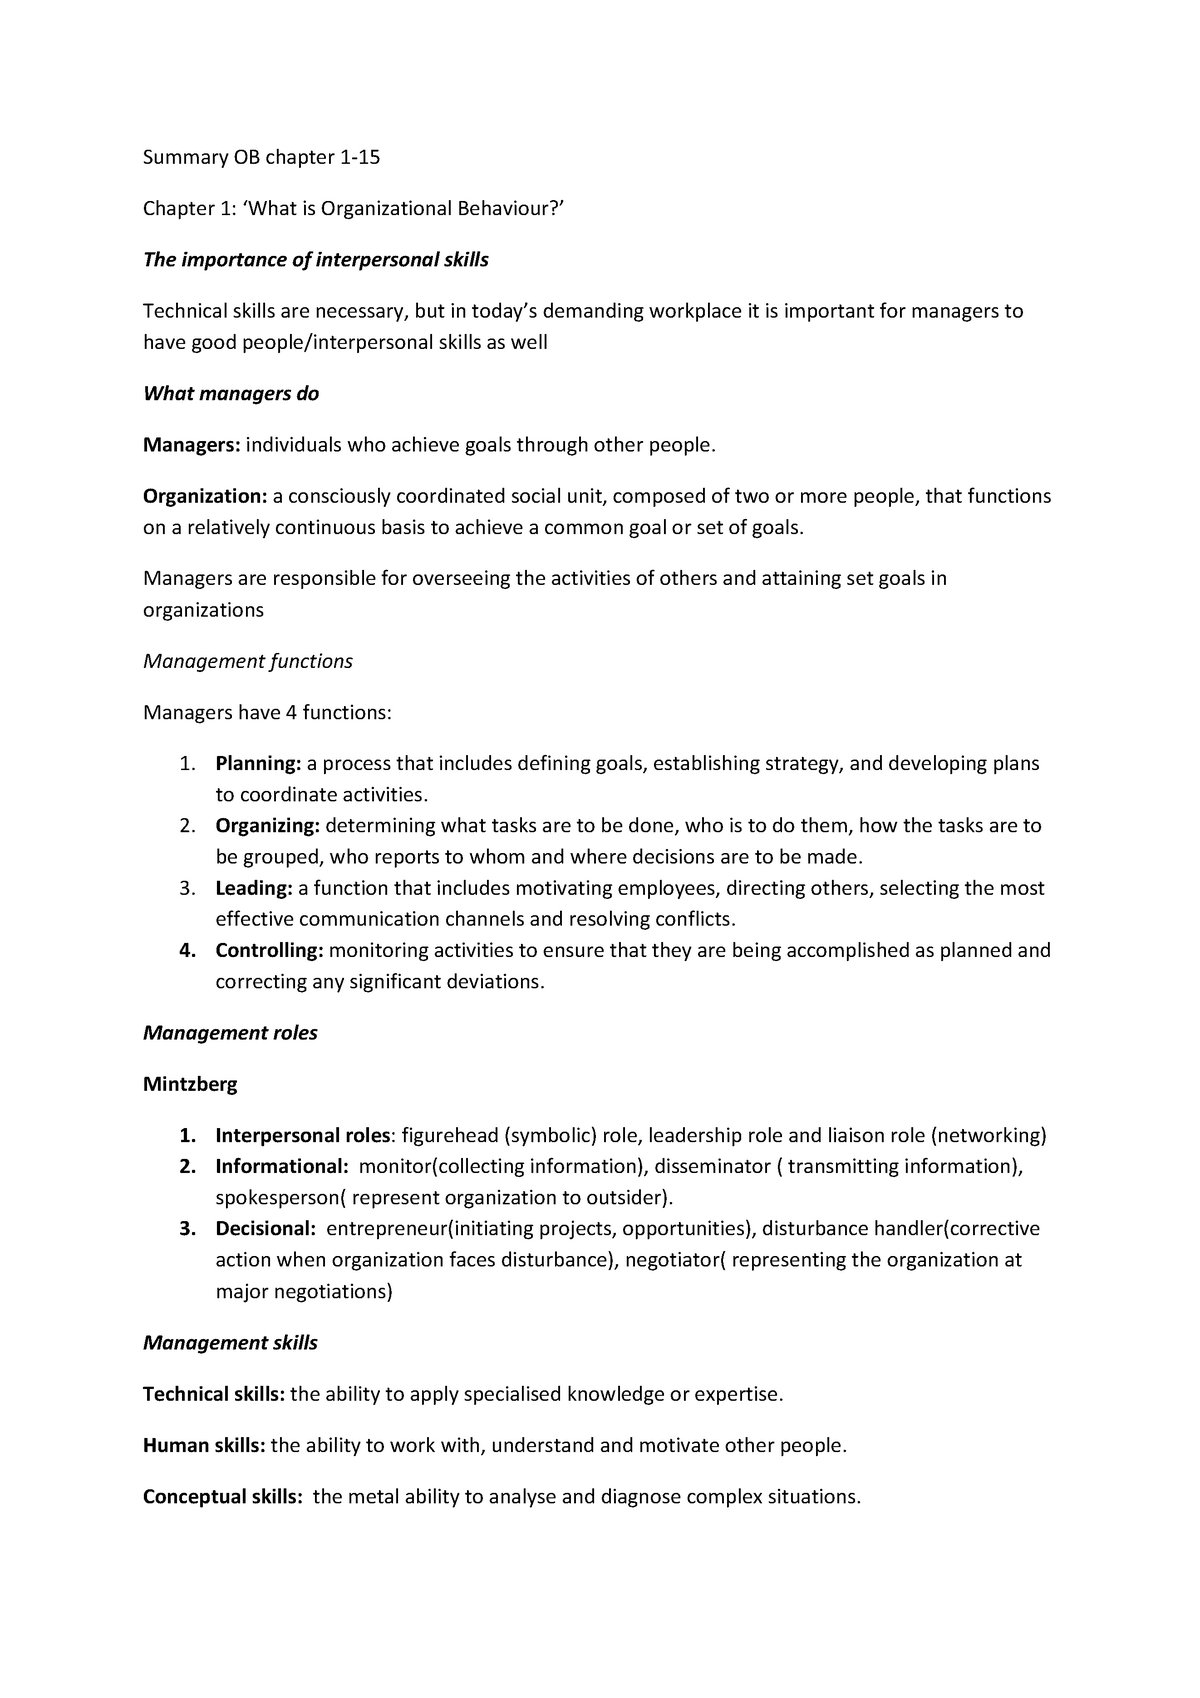 Summary Summary Organizational Behavior, H1-15 25 Nov 2013